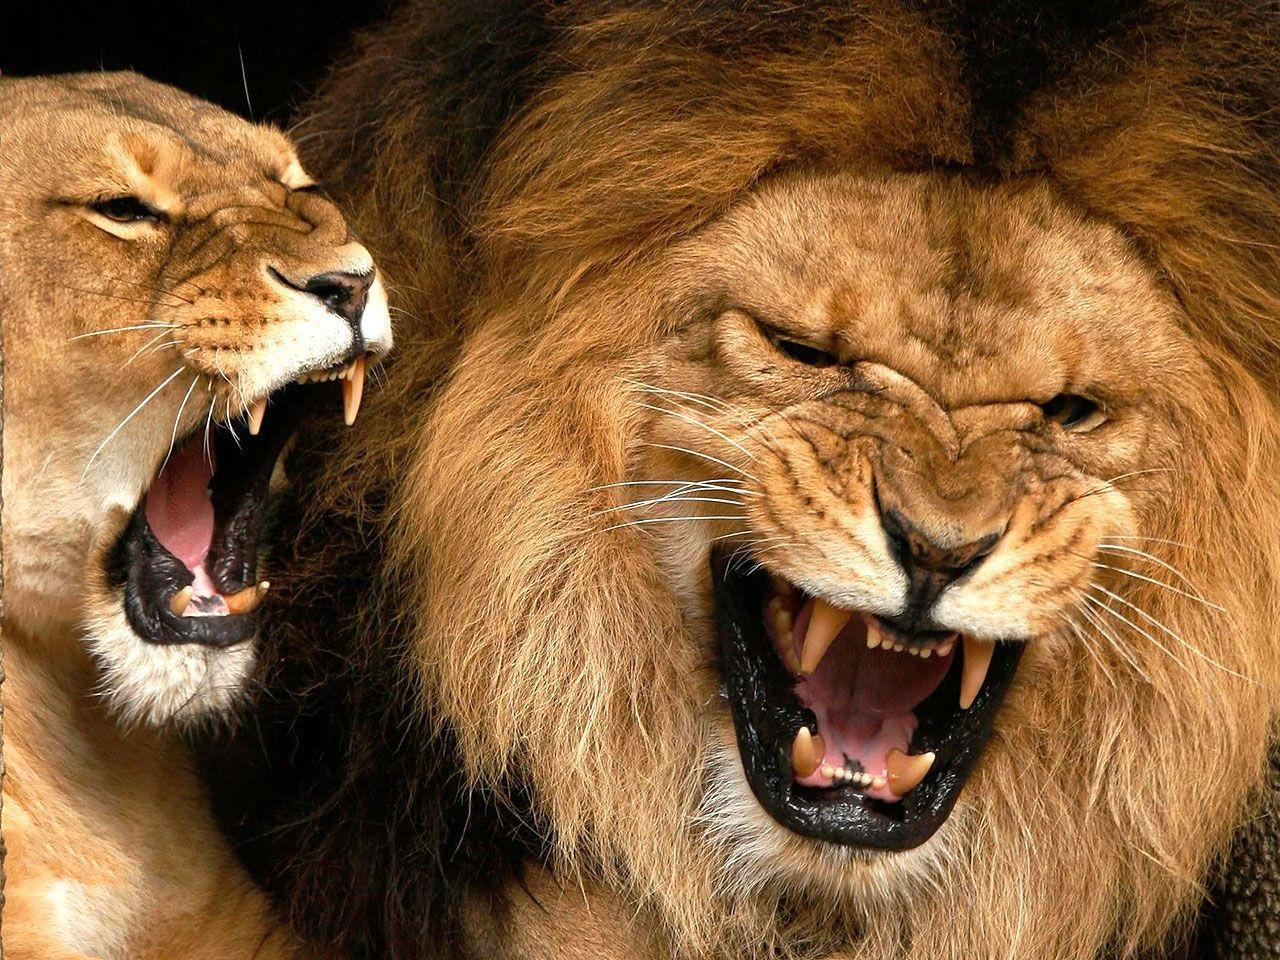 Lions Wallpaper - Wild Lion Animal Wallpaper Gallery